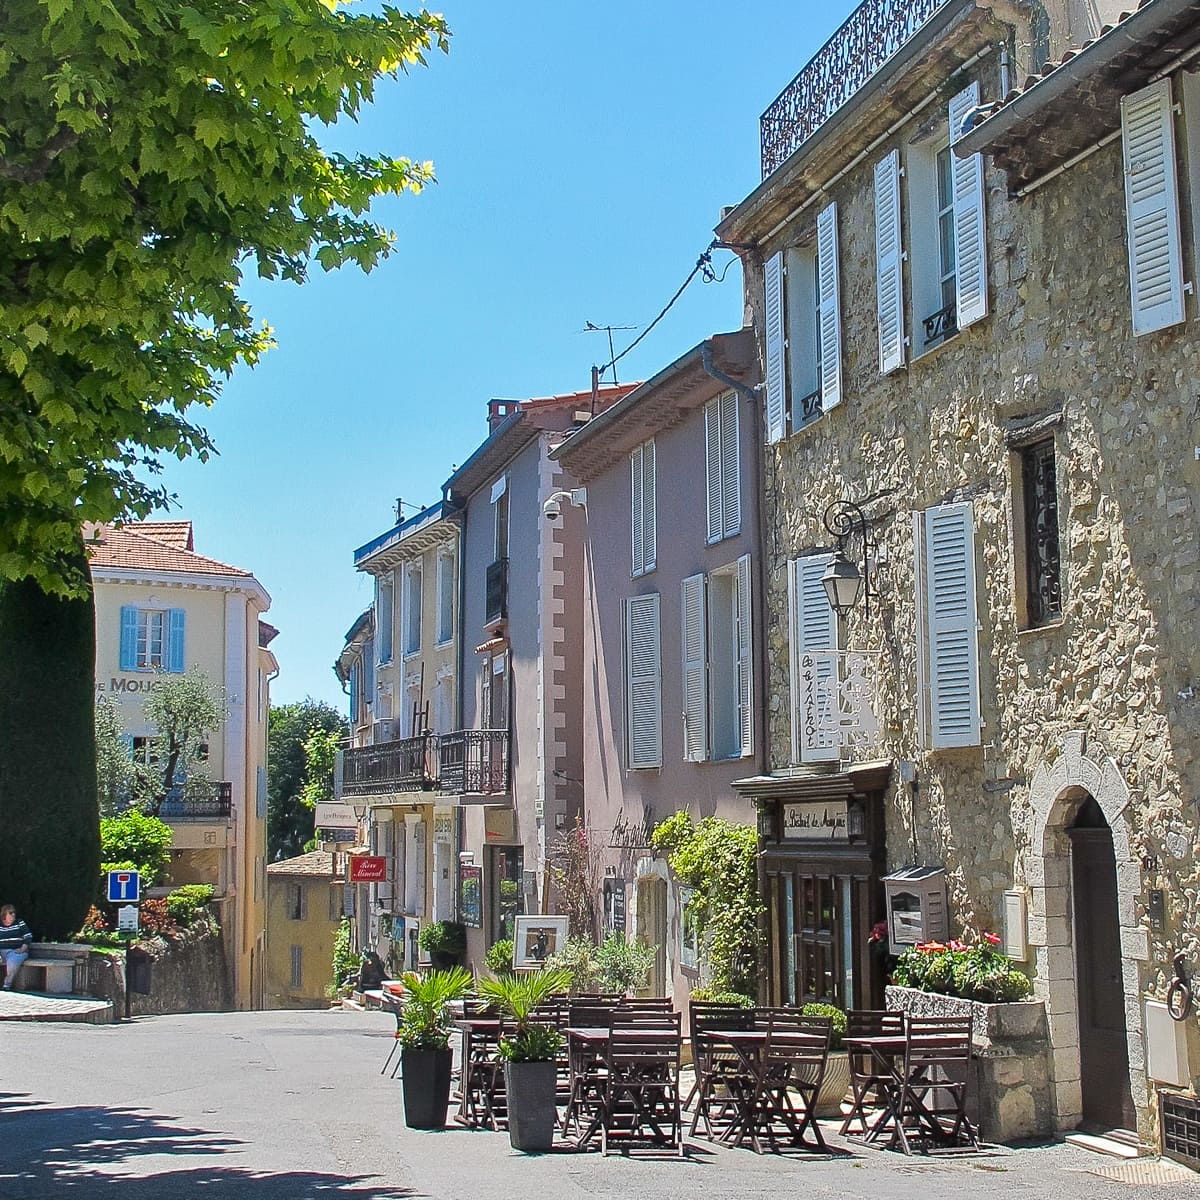 Summer Vacation | South of France - designthusiasm.com